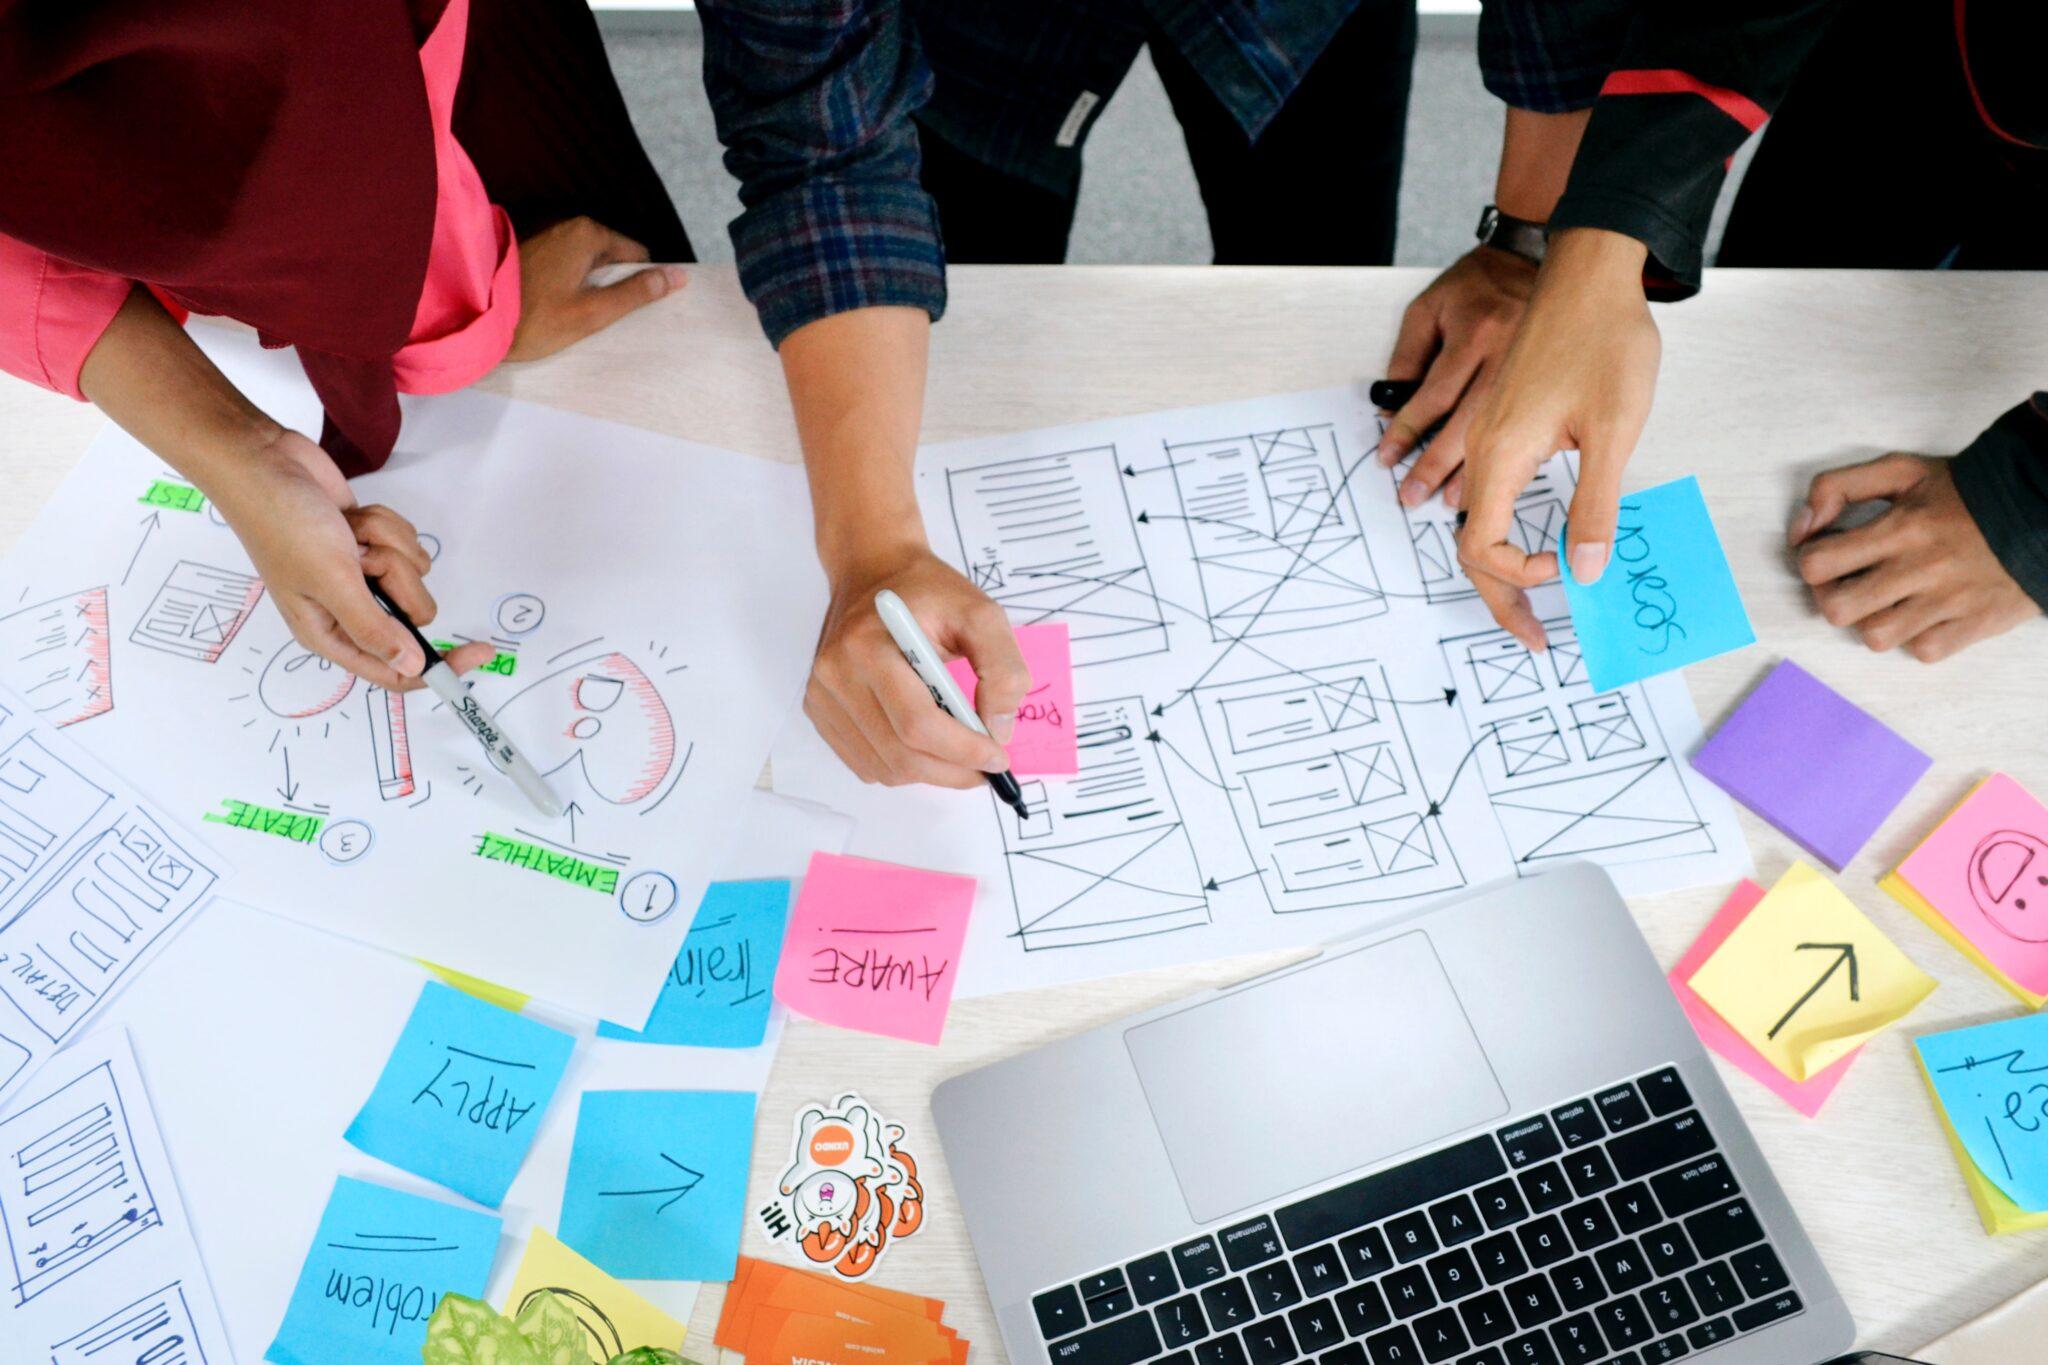 Provincie Zuid-Holland Design Thinking